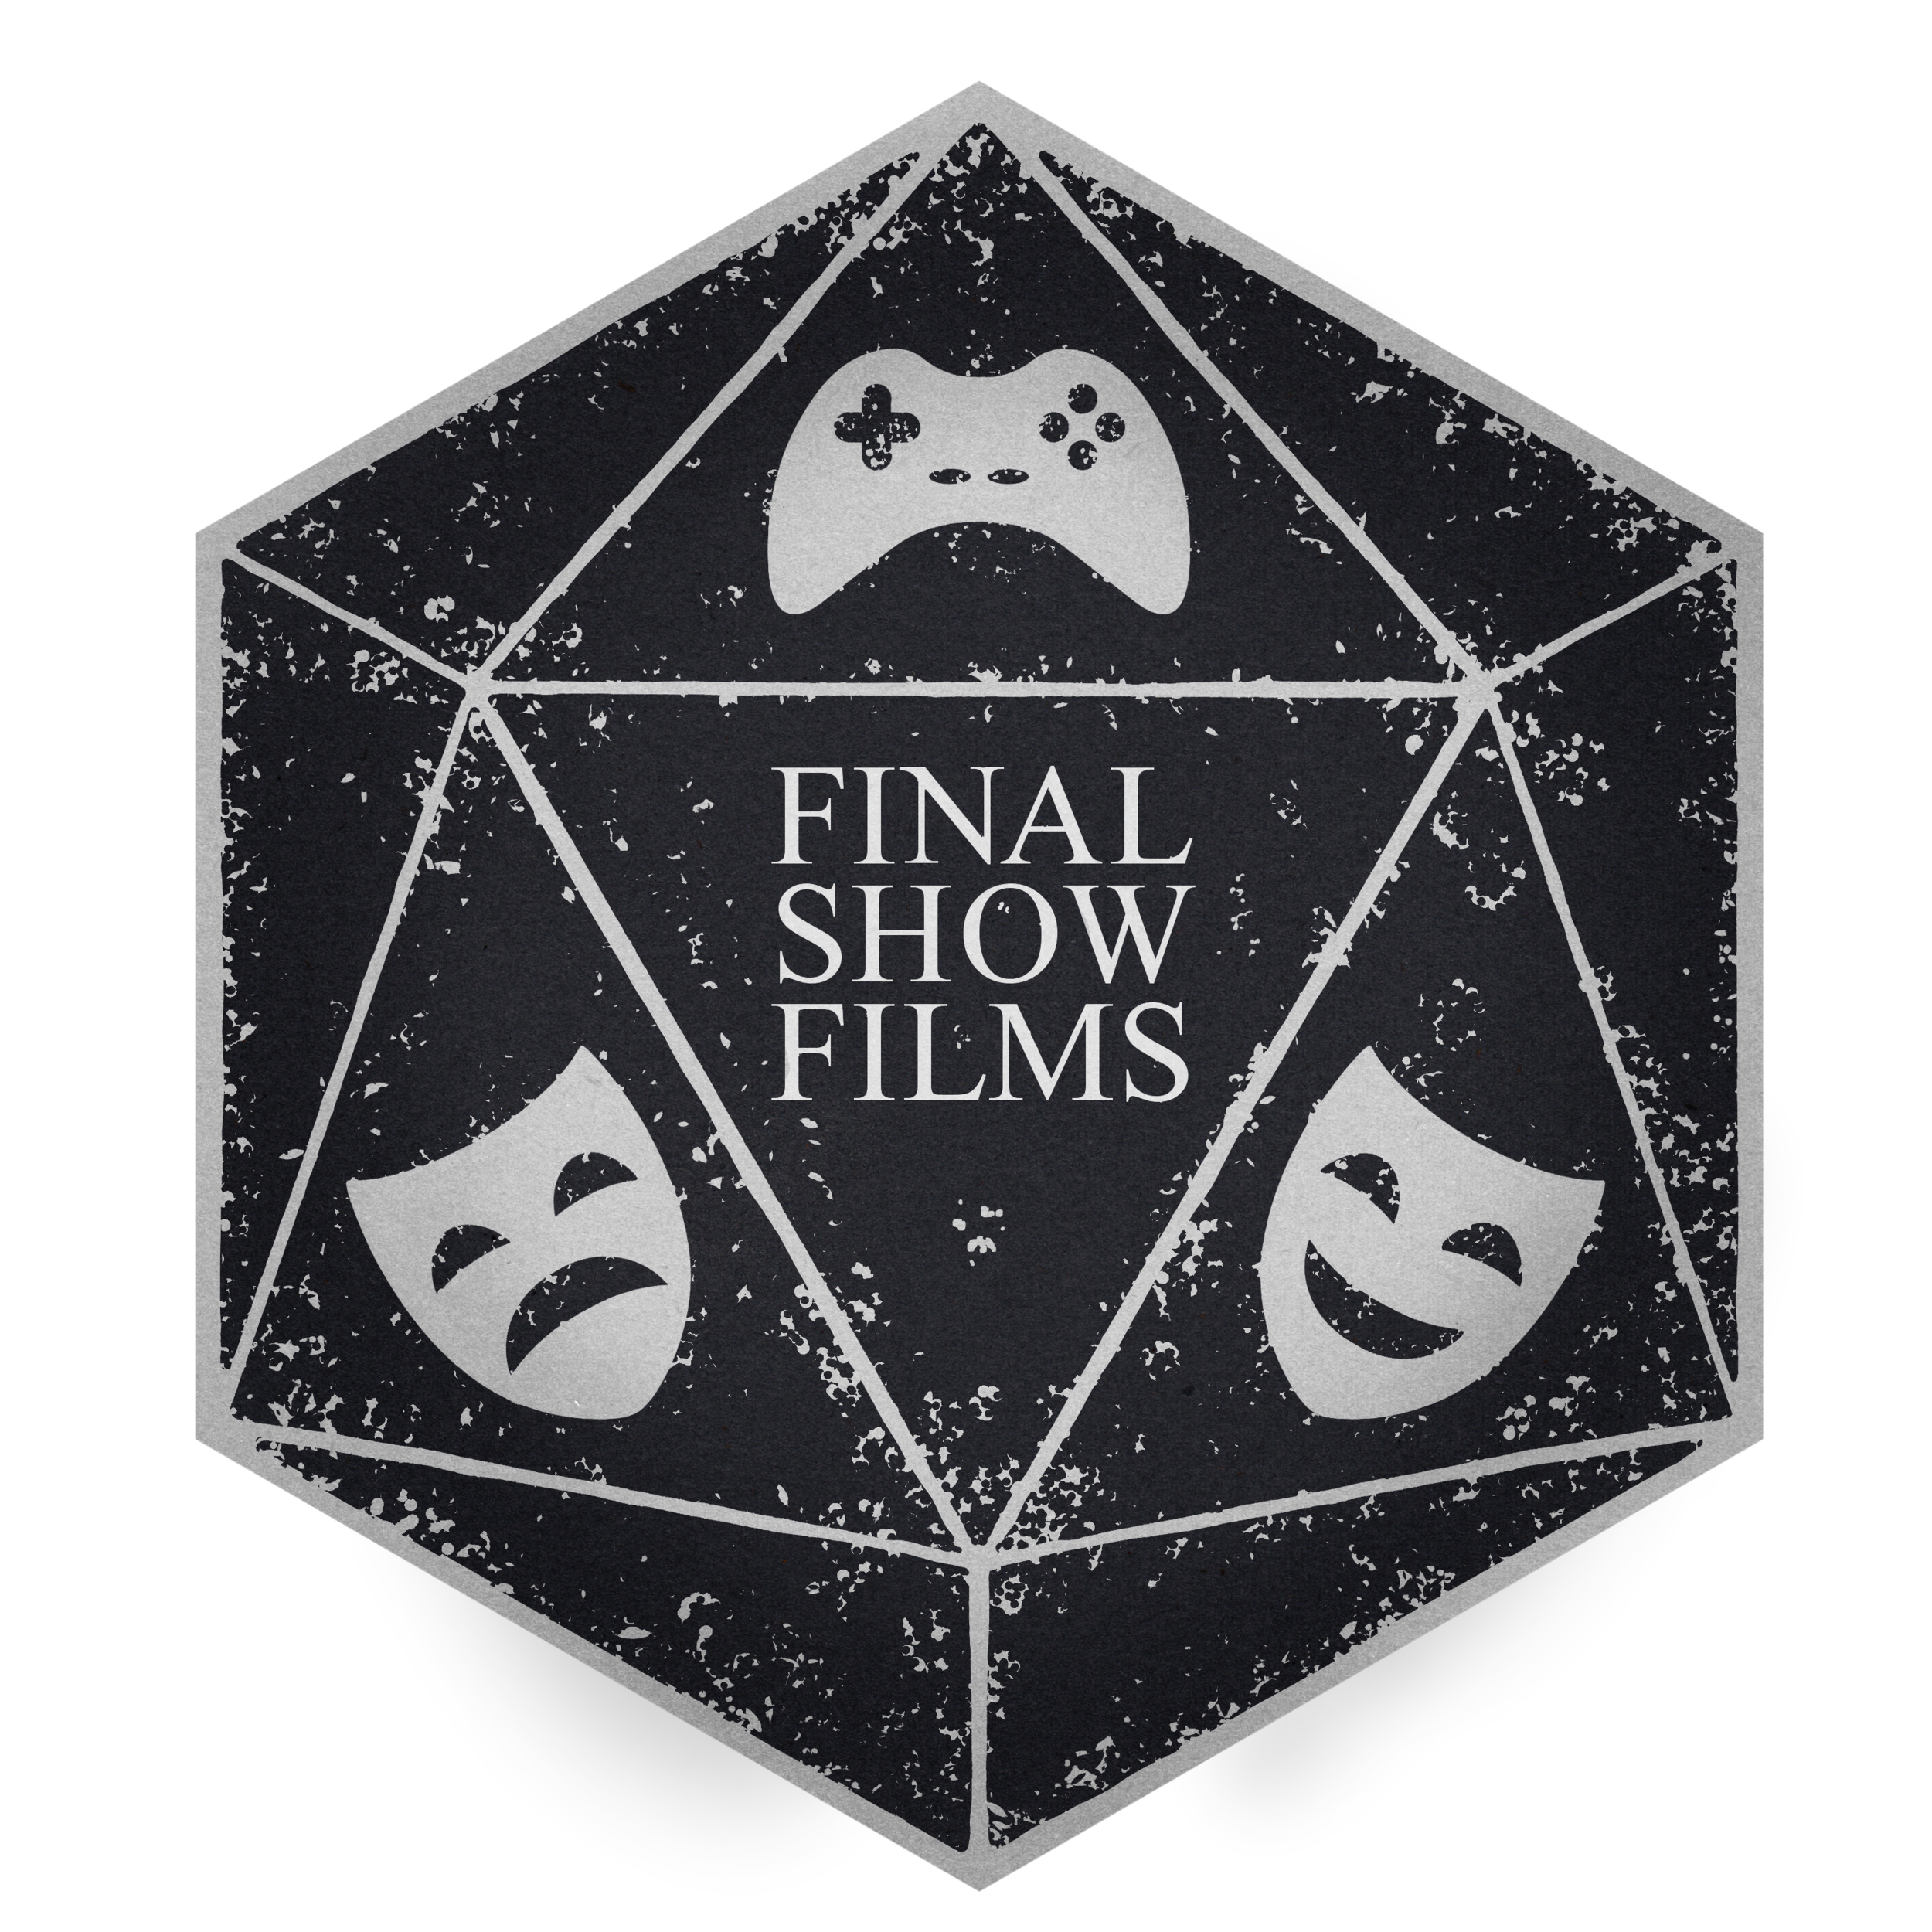 Final Show Films 01.png